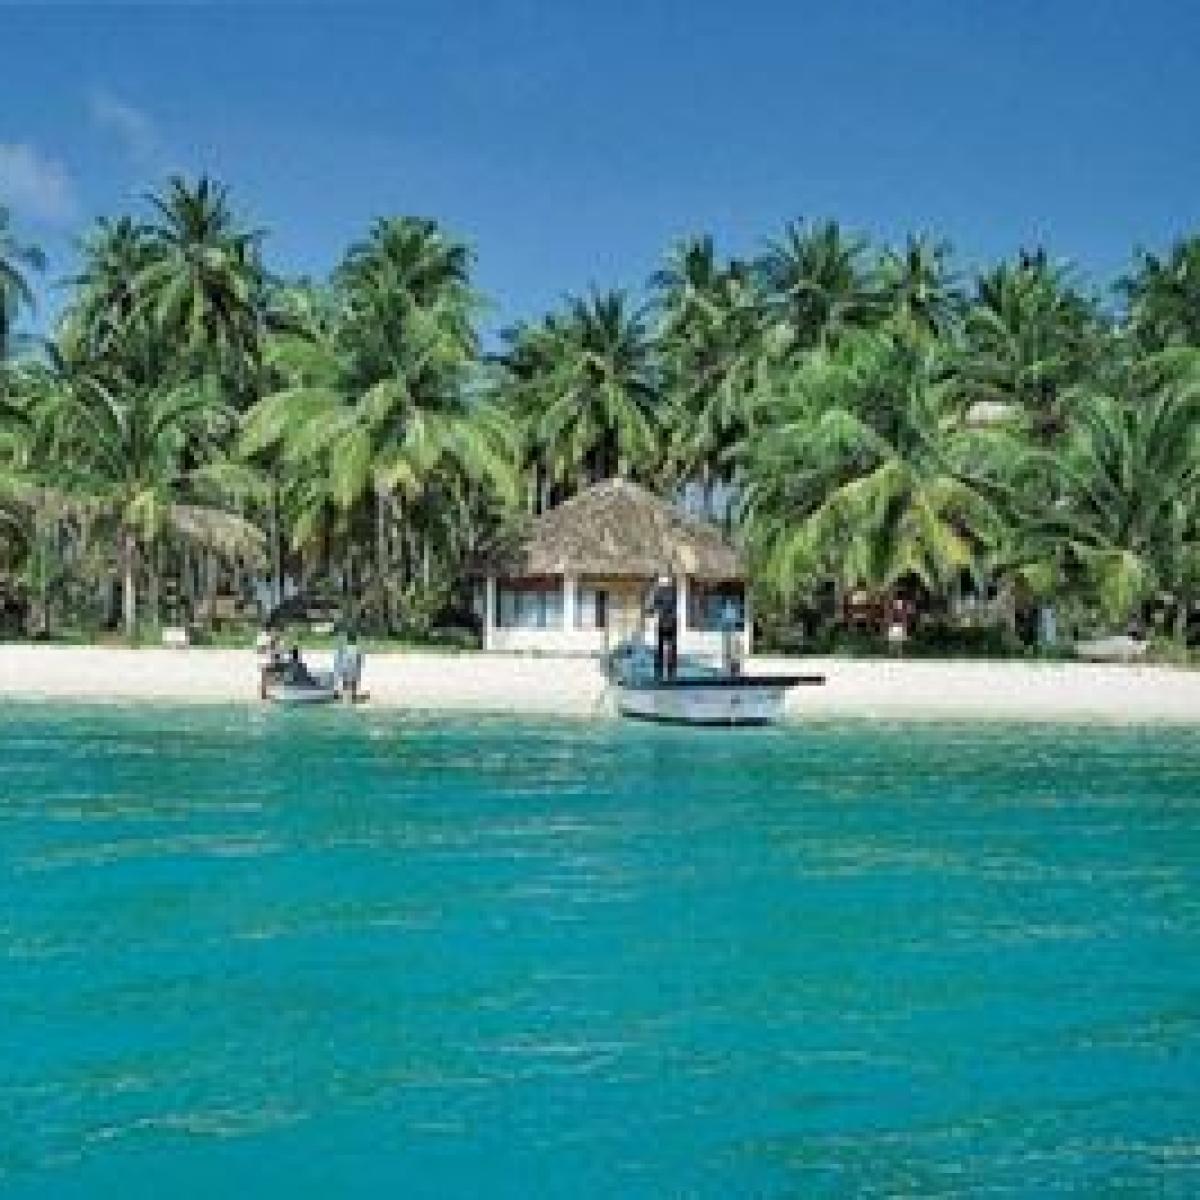 Lakshadweep admin justifies reform push, says it wants to develop islands like Maldives